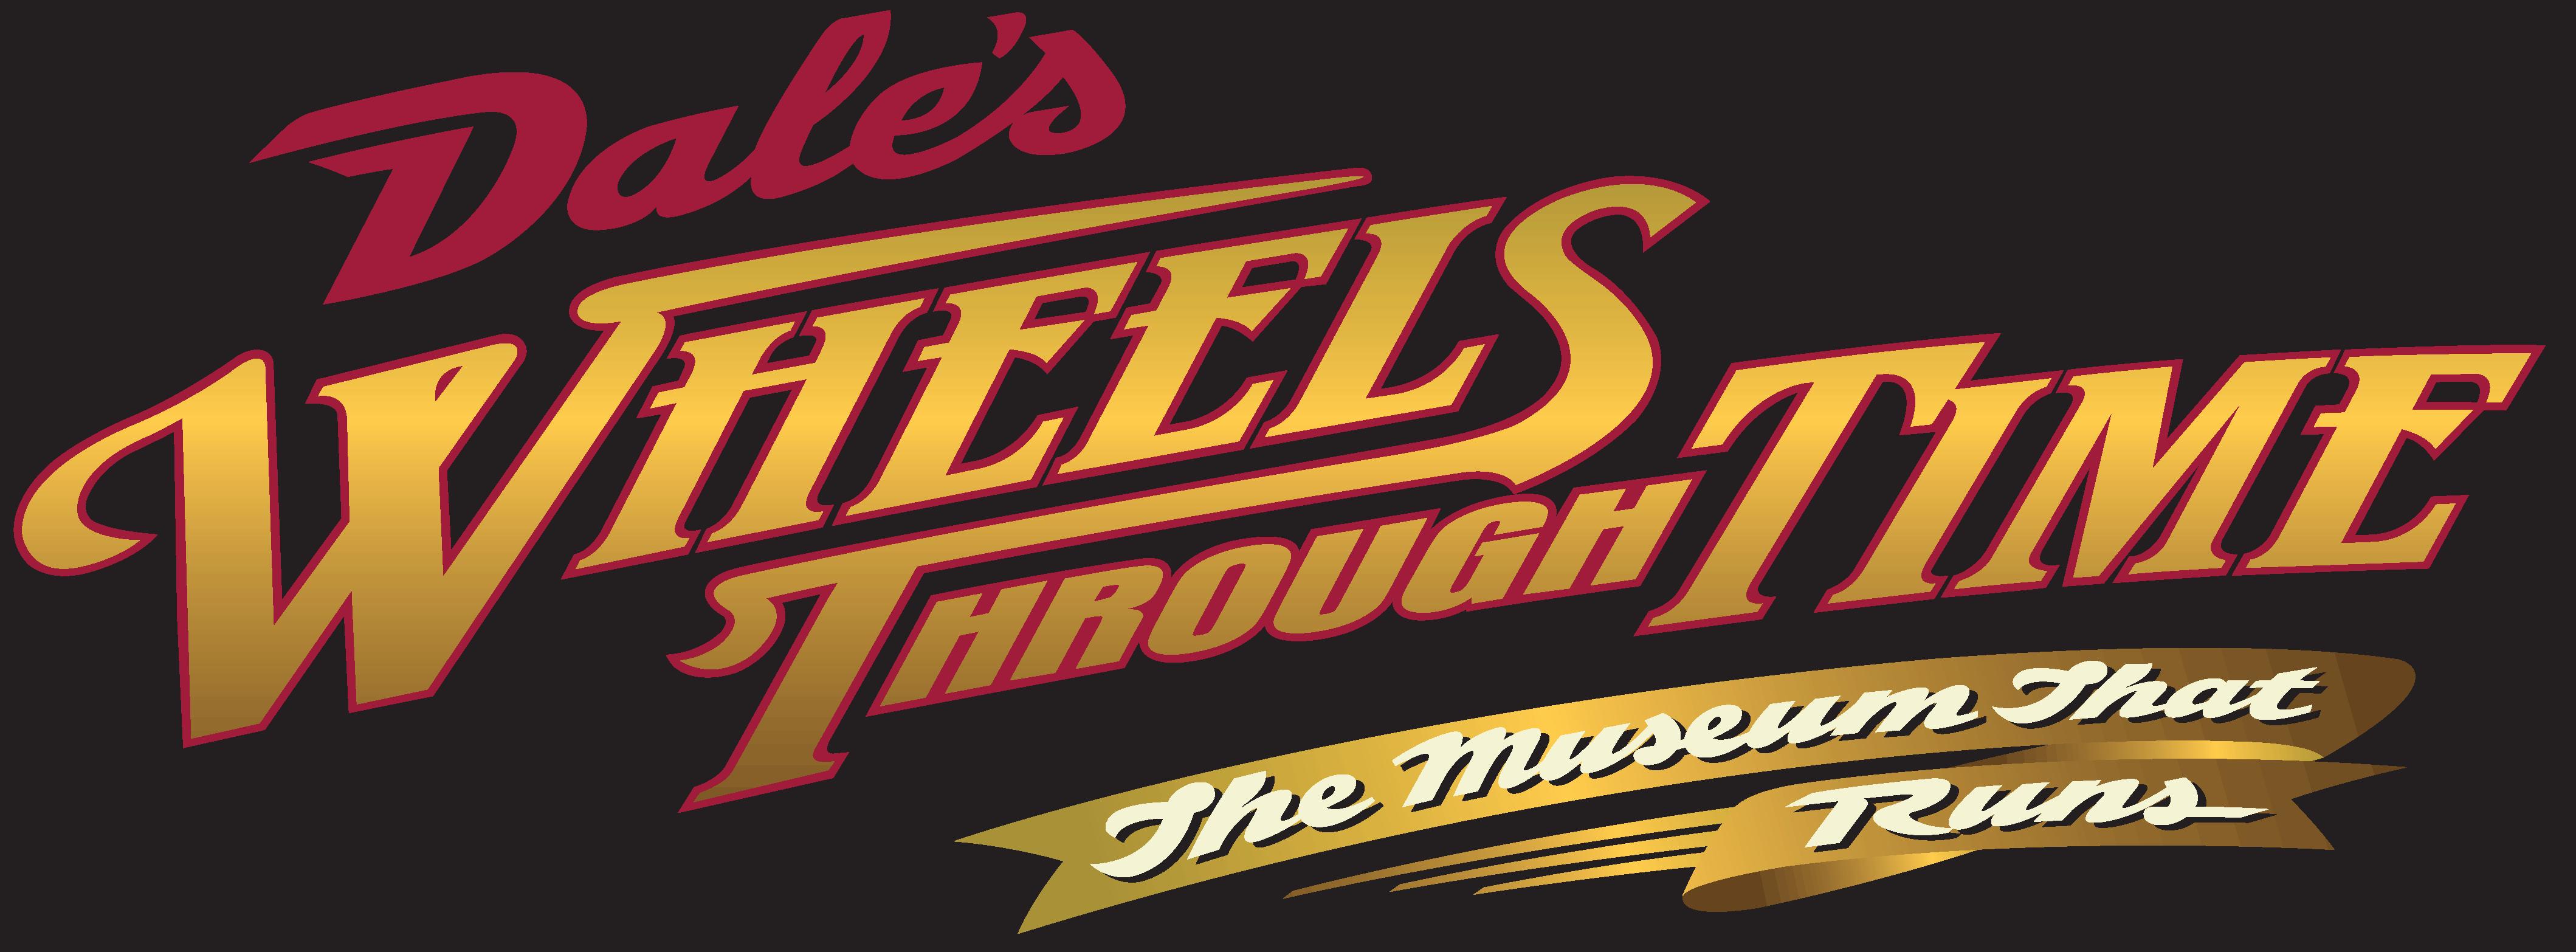 Wheels Through Time